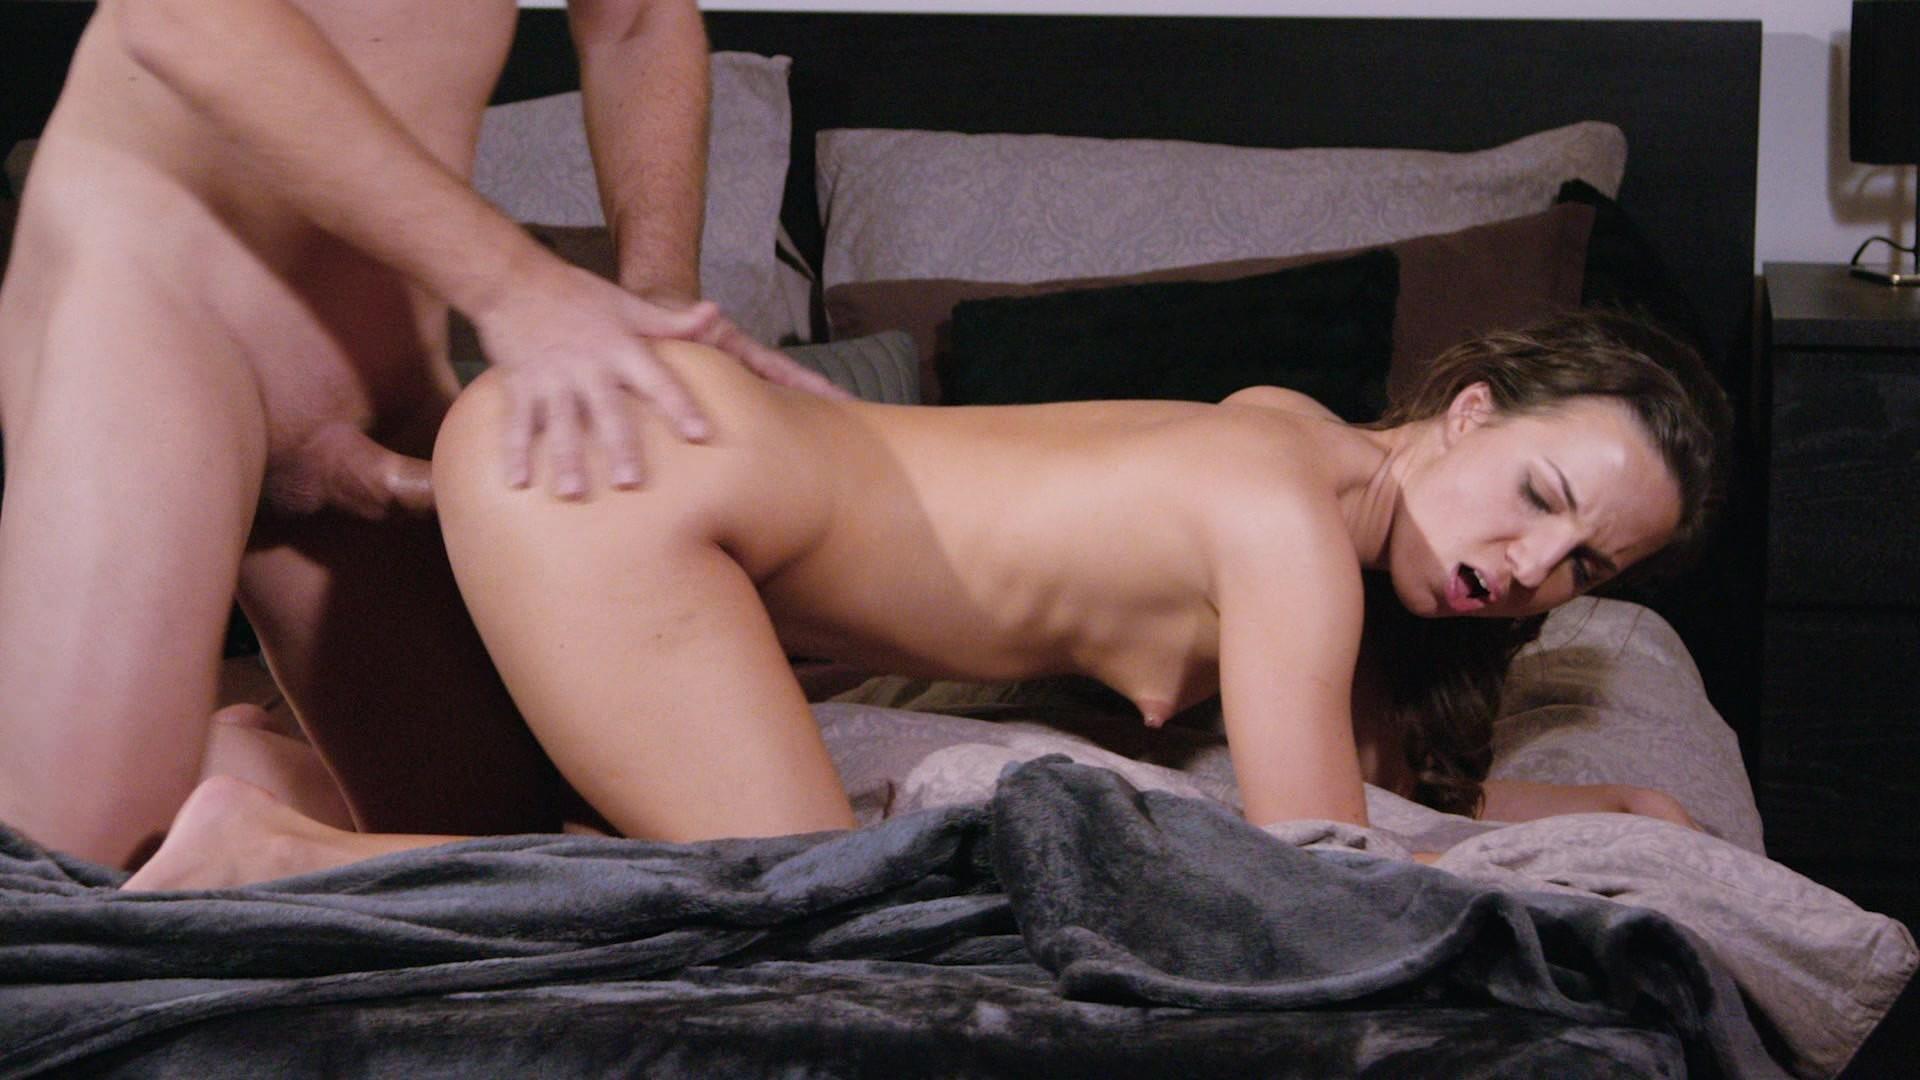 Porn therapist 8